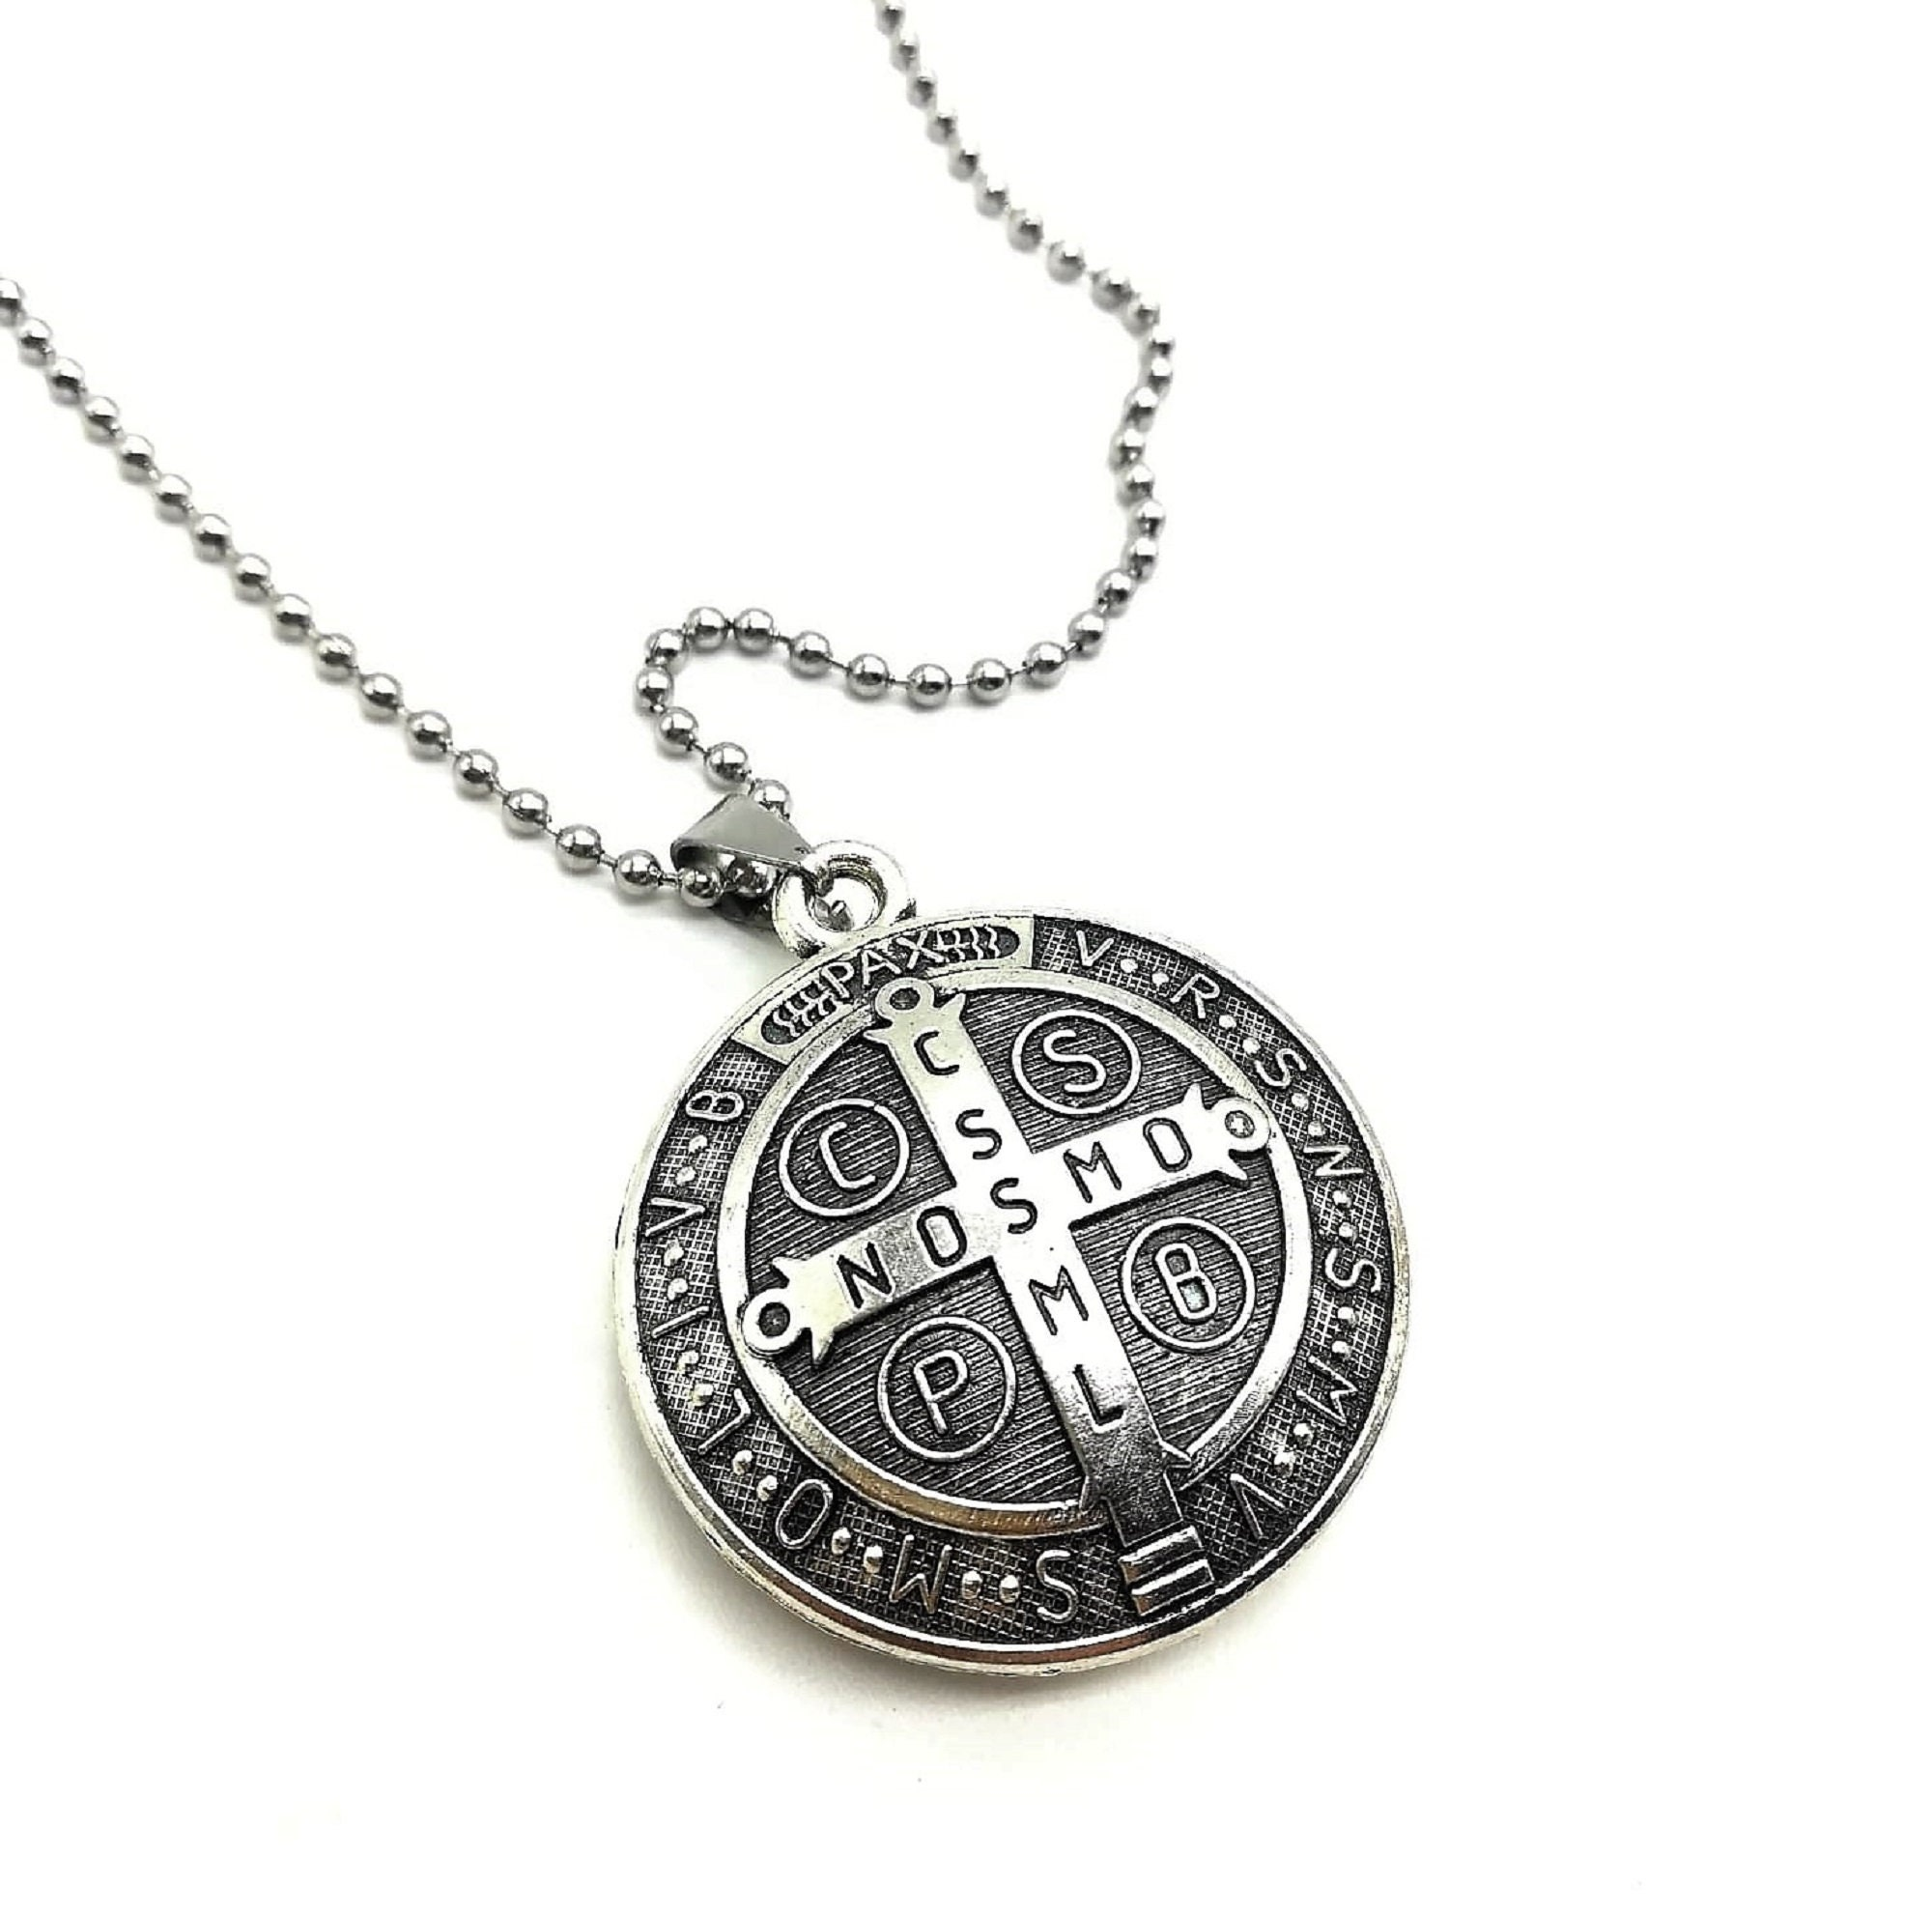 Saint Medal Necklace Catholic Necklace St Benedict Necklace Patron Saint Necklace Saint Benedict Medal Necklace Catholic Jewelry.